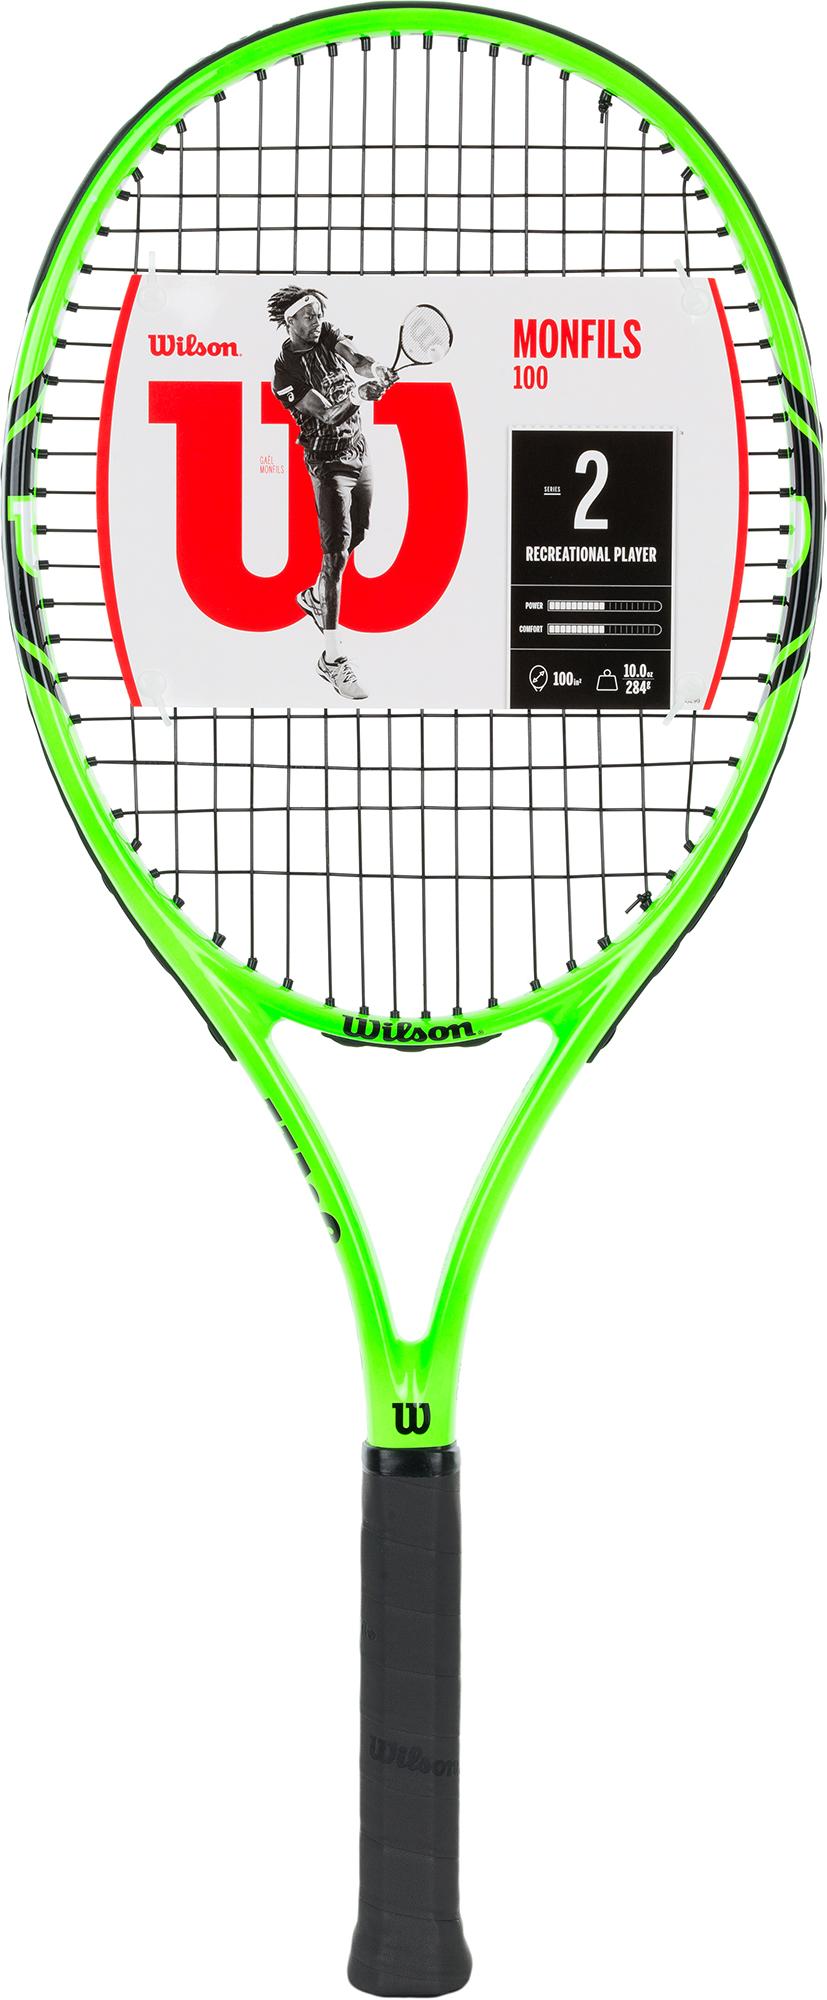 Wilson Ракетка для большого тенниса Wilson Monfils, размер 3 wilson набор мячей для большого тенниса wilson us open x3 размер без размера